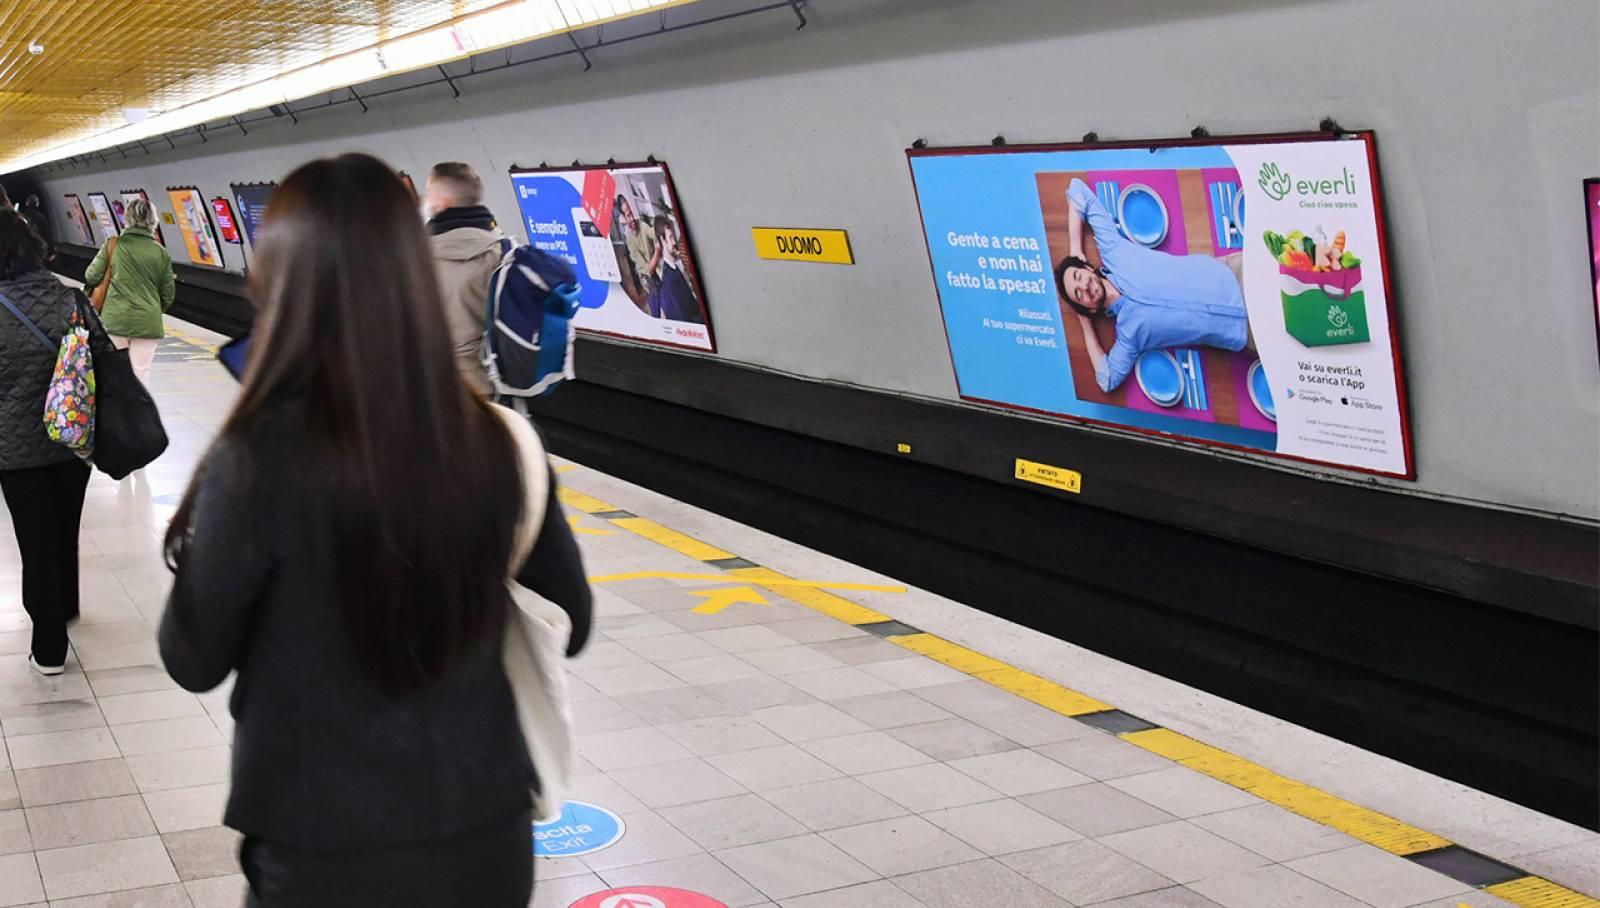 IGPDecaux OOH Milano Circuito Maxi in metropolitana per Everli